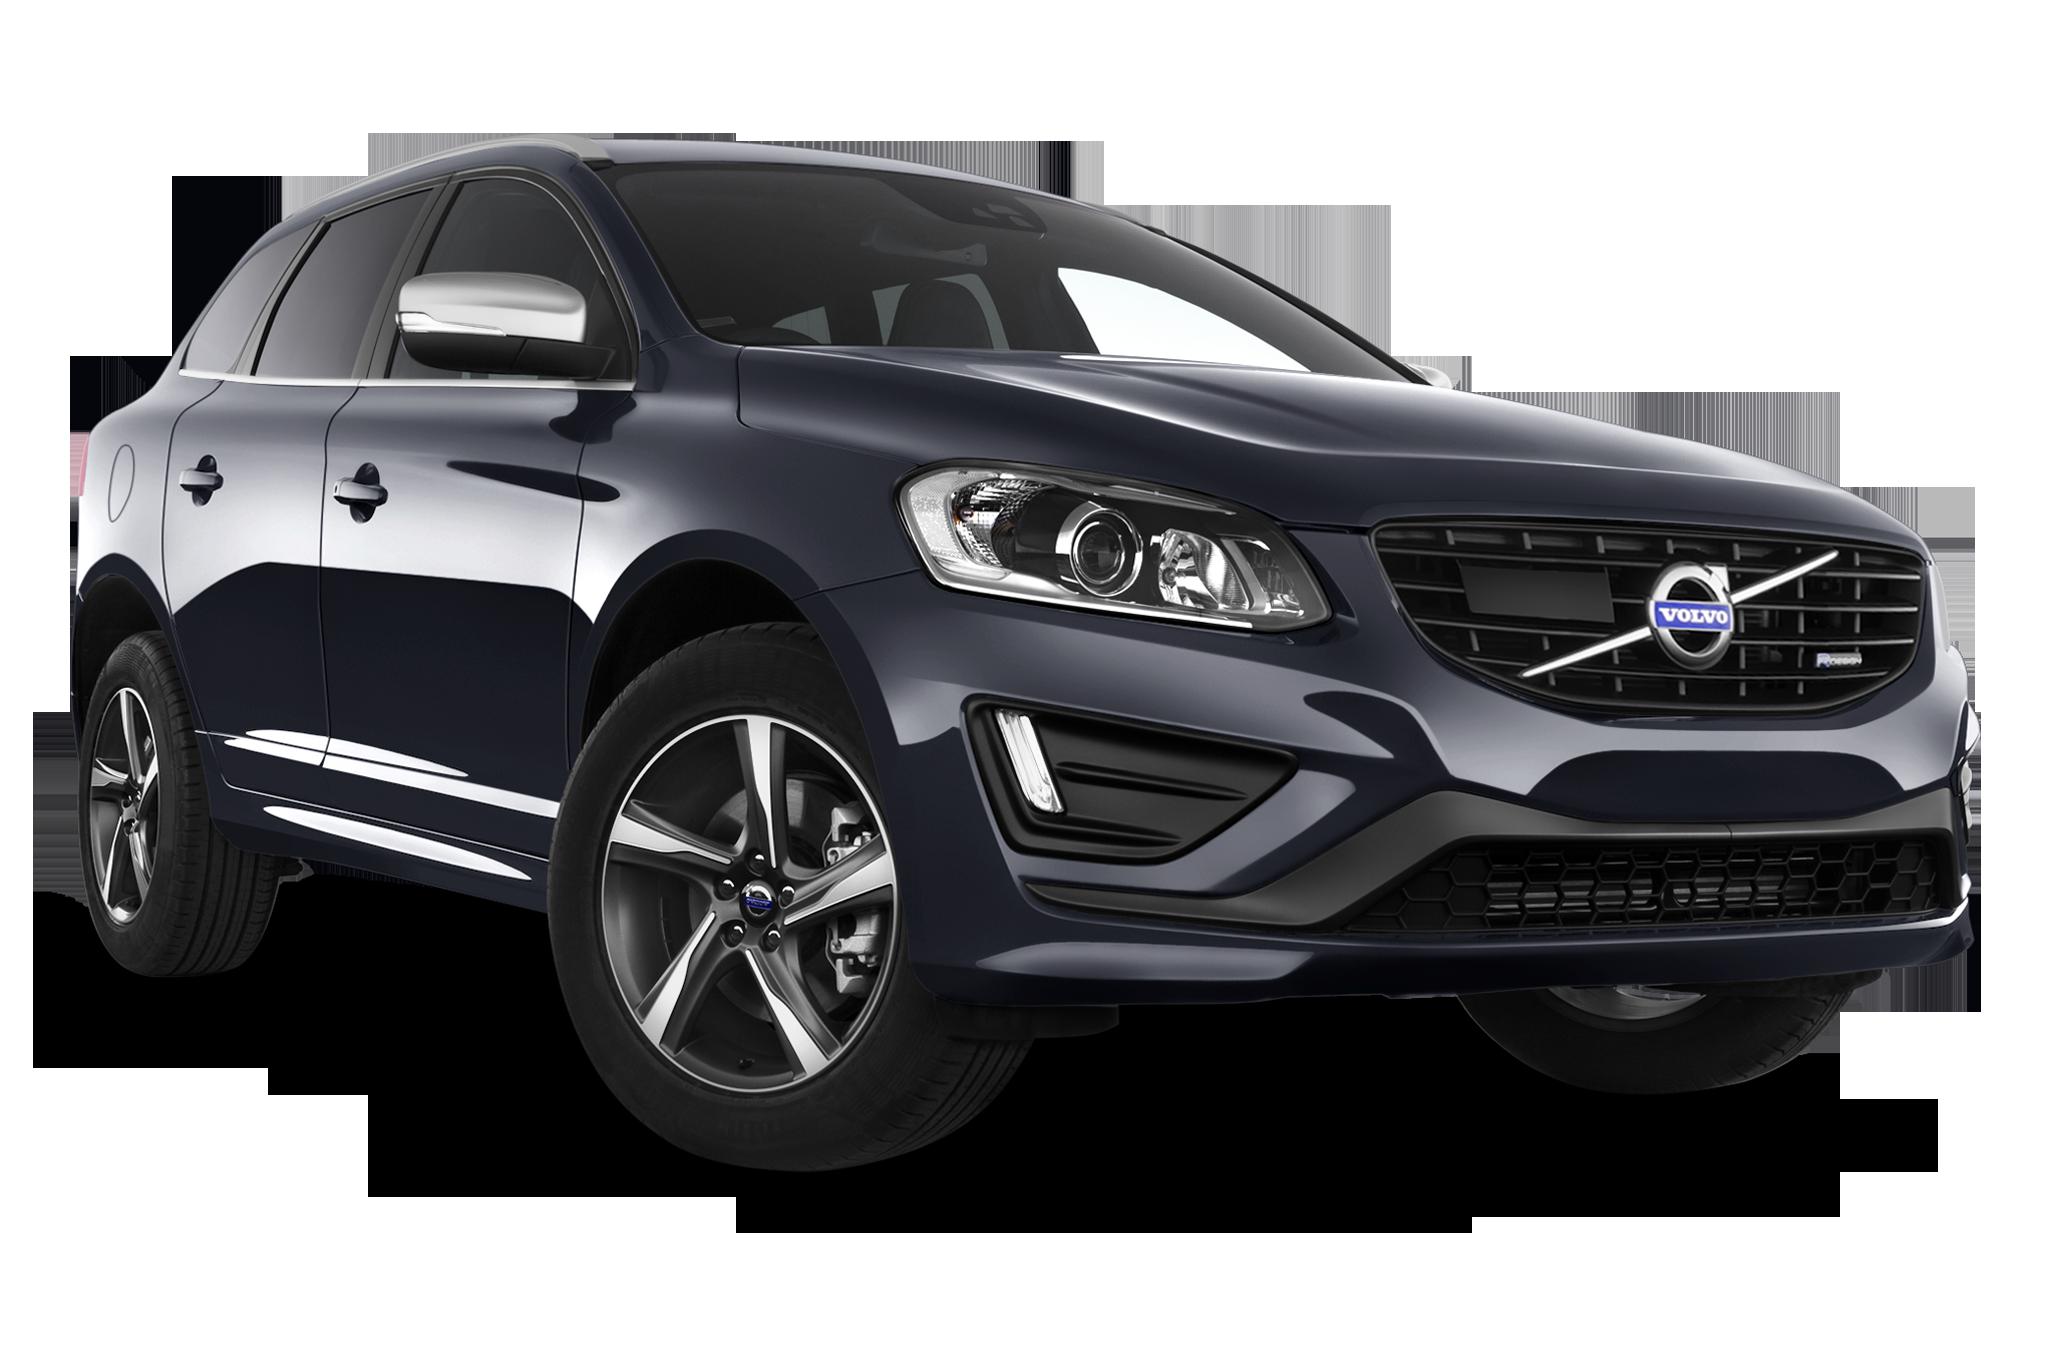 Volvo XC60 | Vehicle Review | Arval UK Ltd